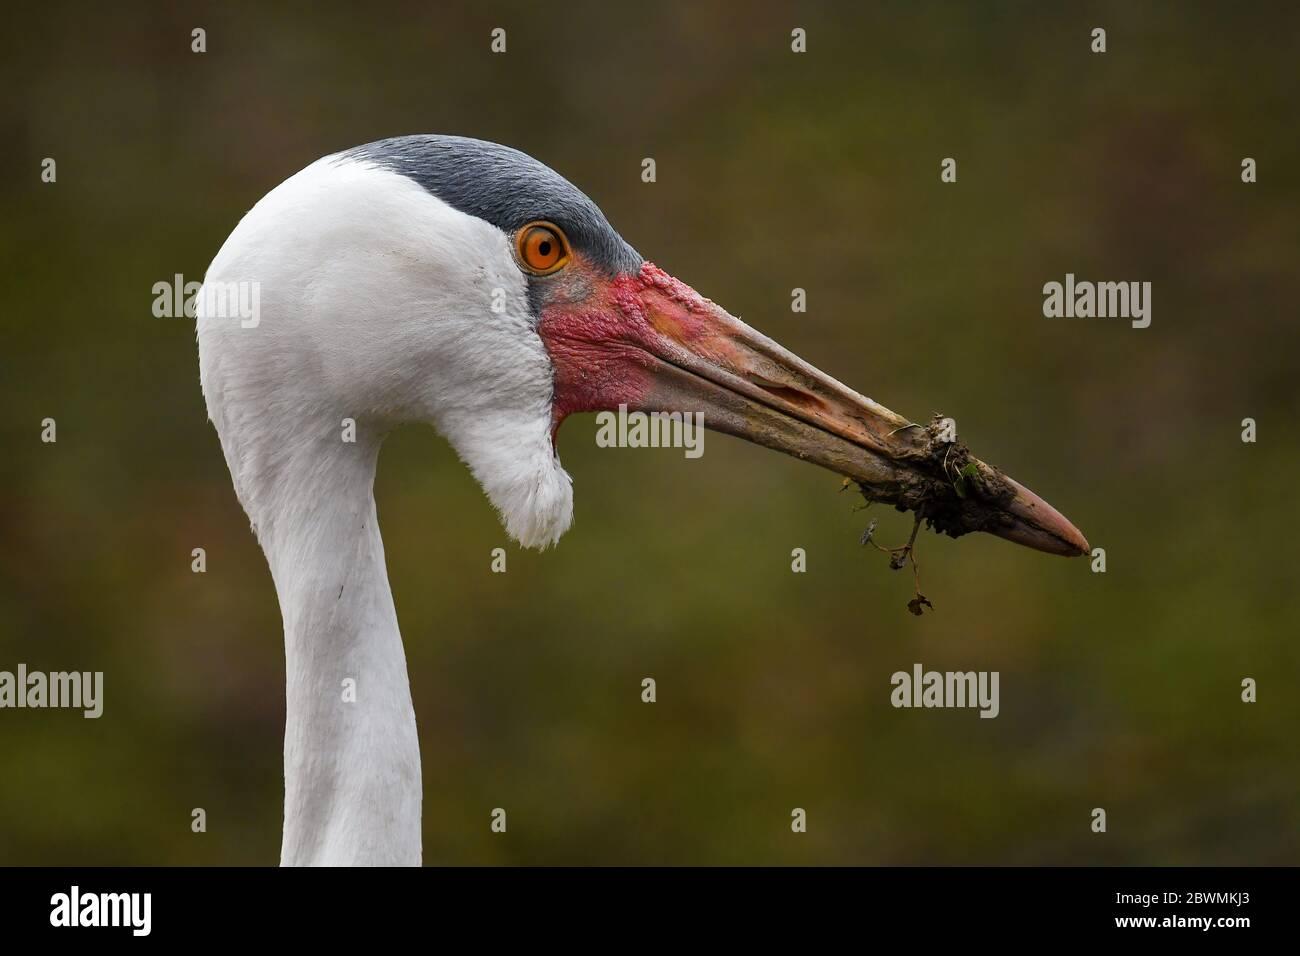 Wattled Crane - Bugeranus carunculatus, portrait of large crane from African savannas and swamps, Ethiopia. Stock Photo